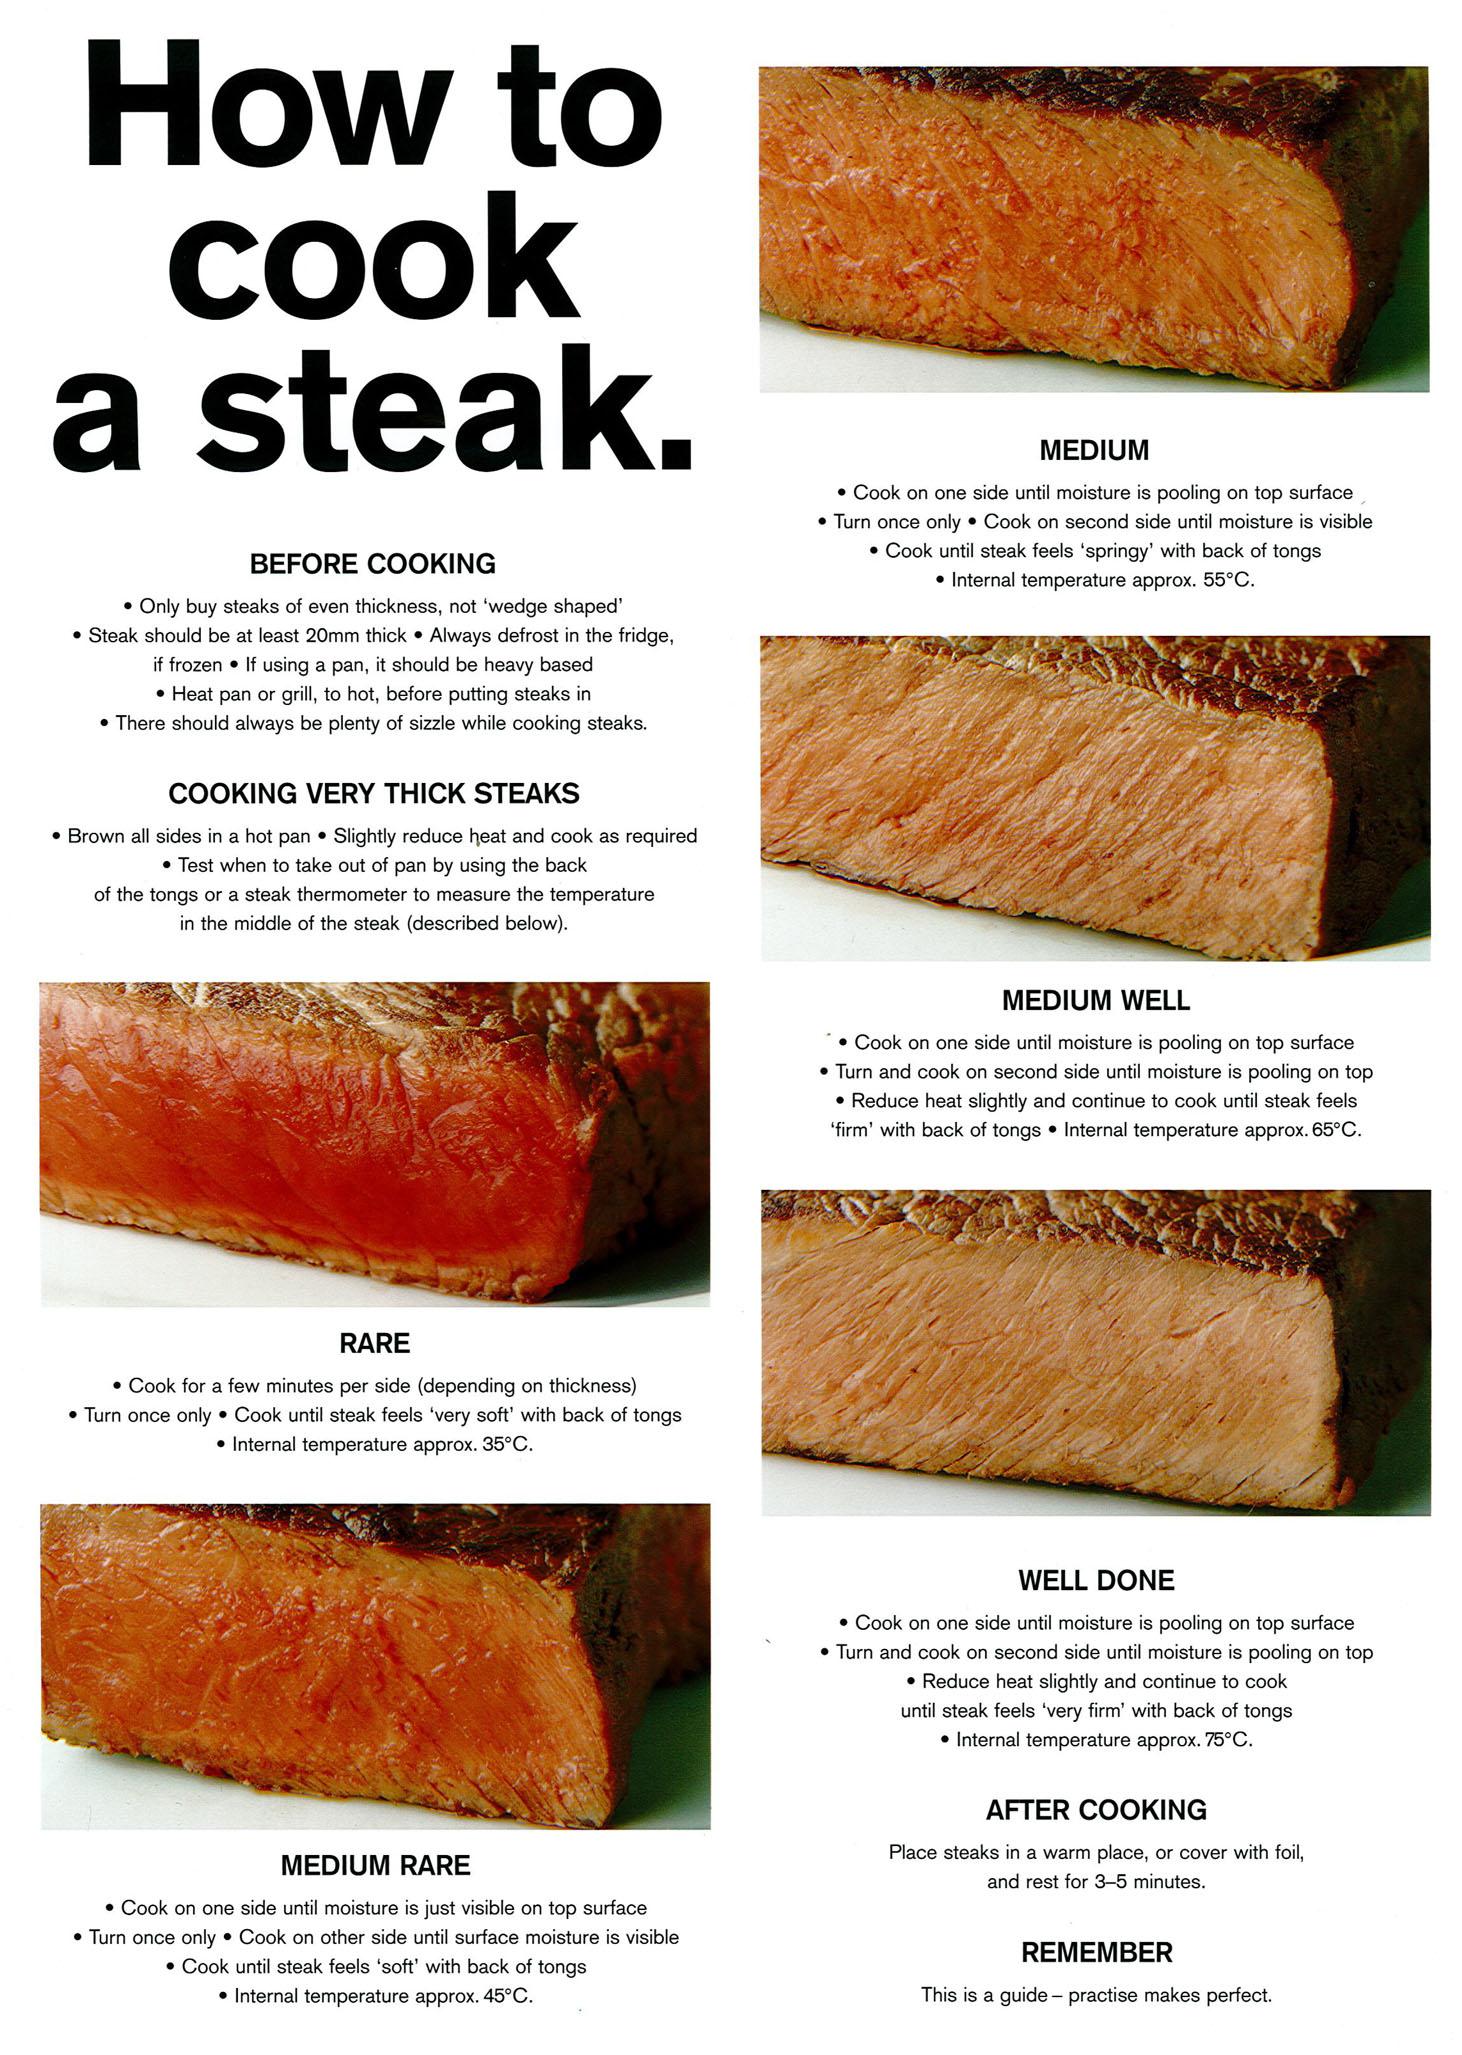 Cooking a steak - best methods